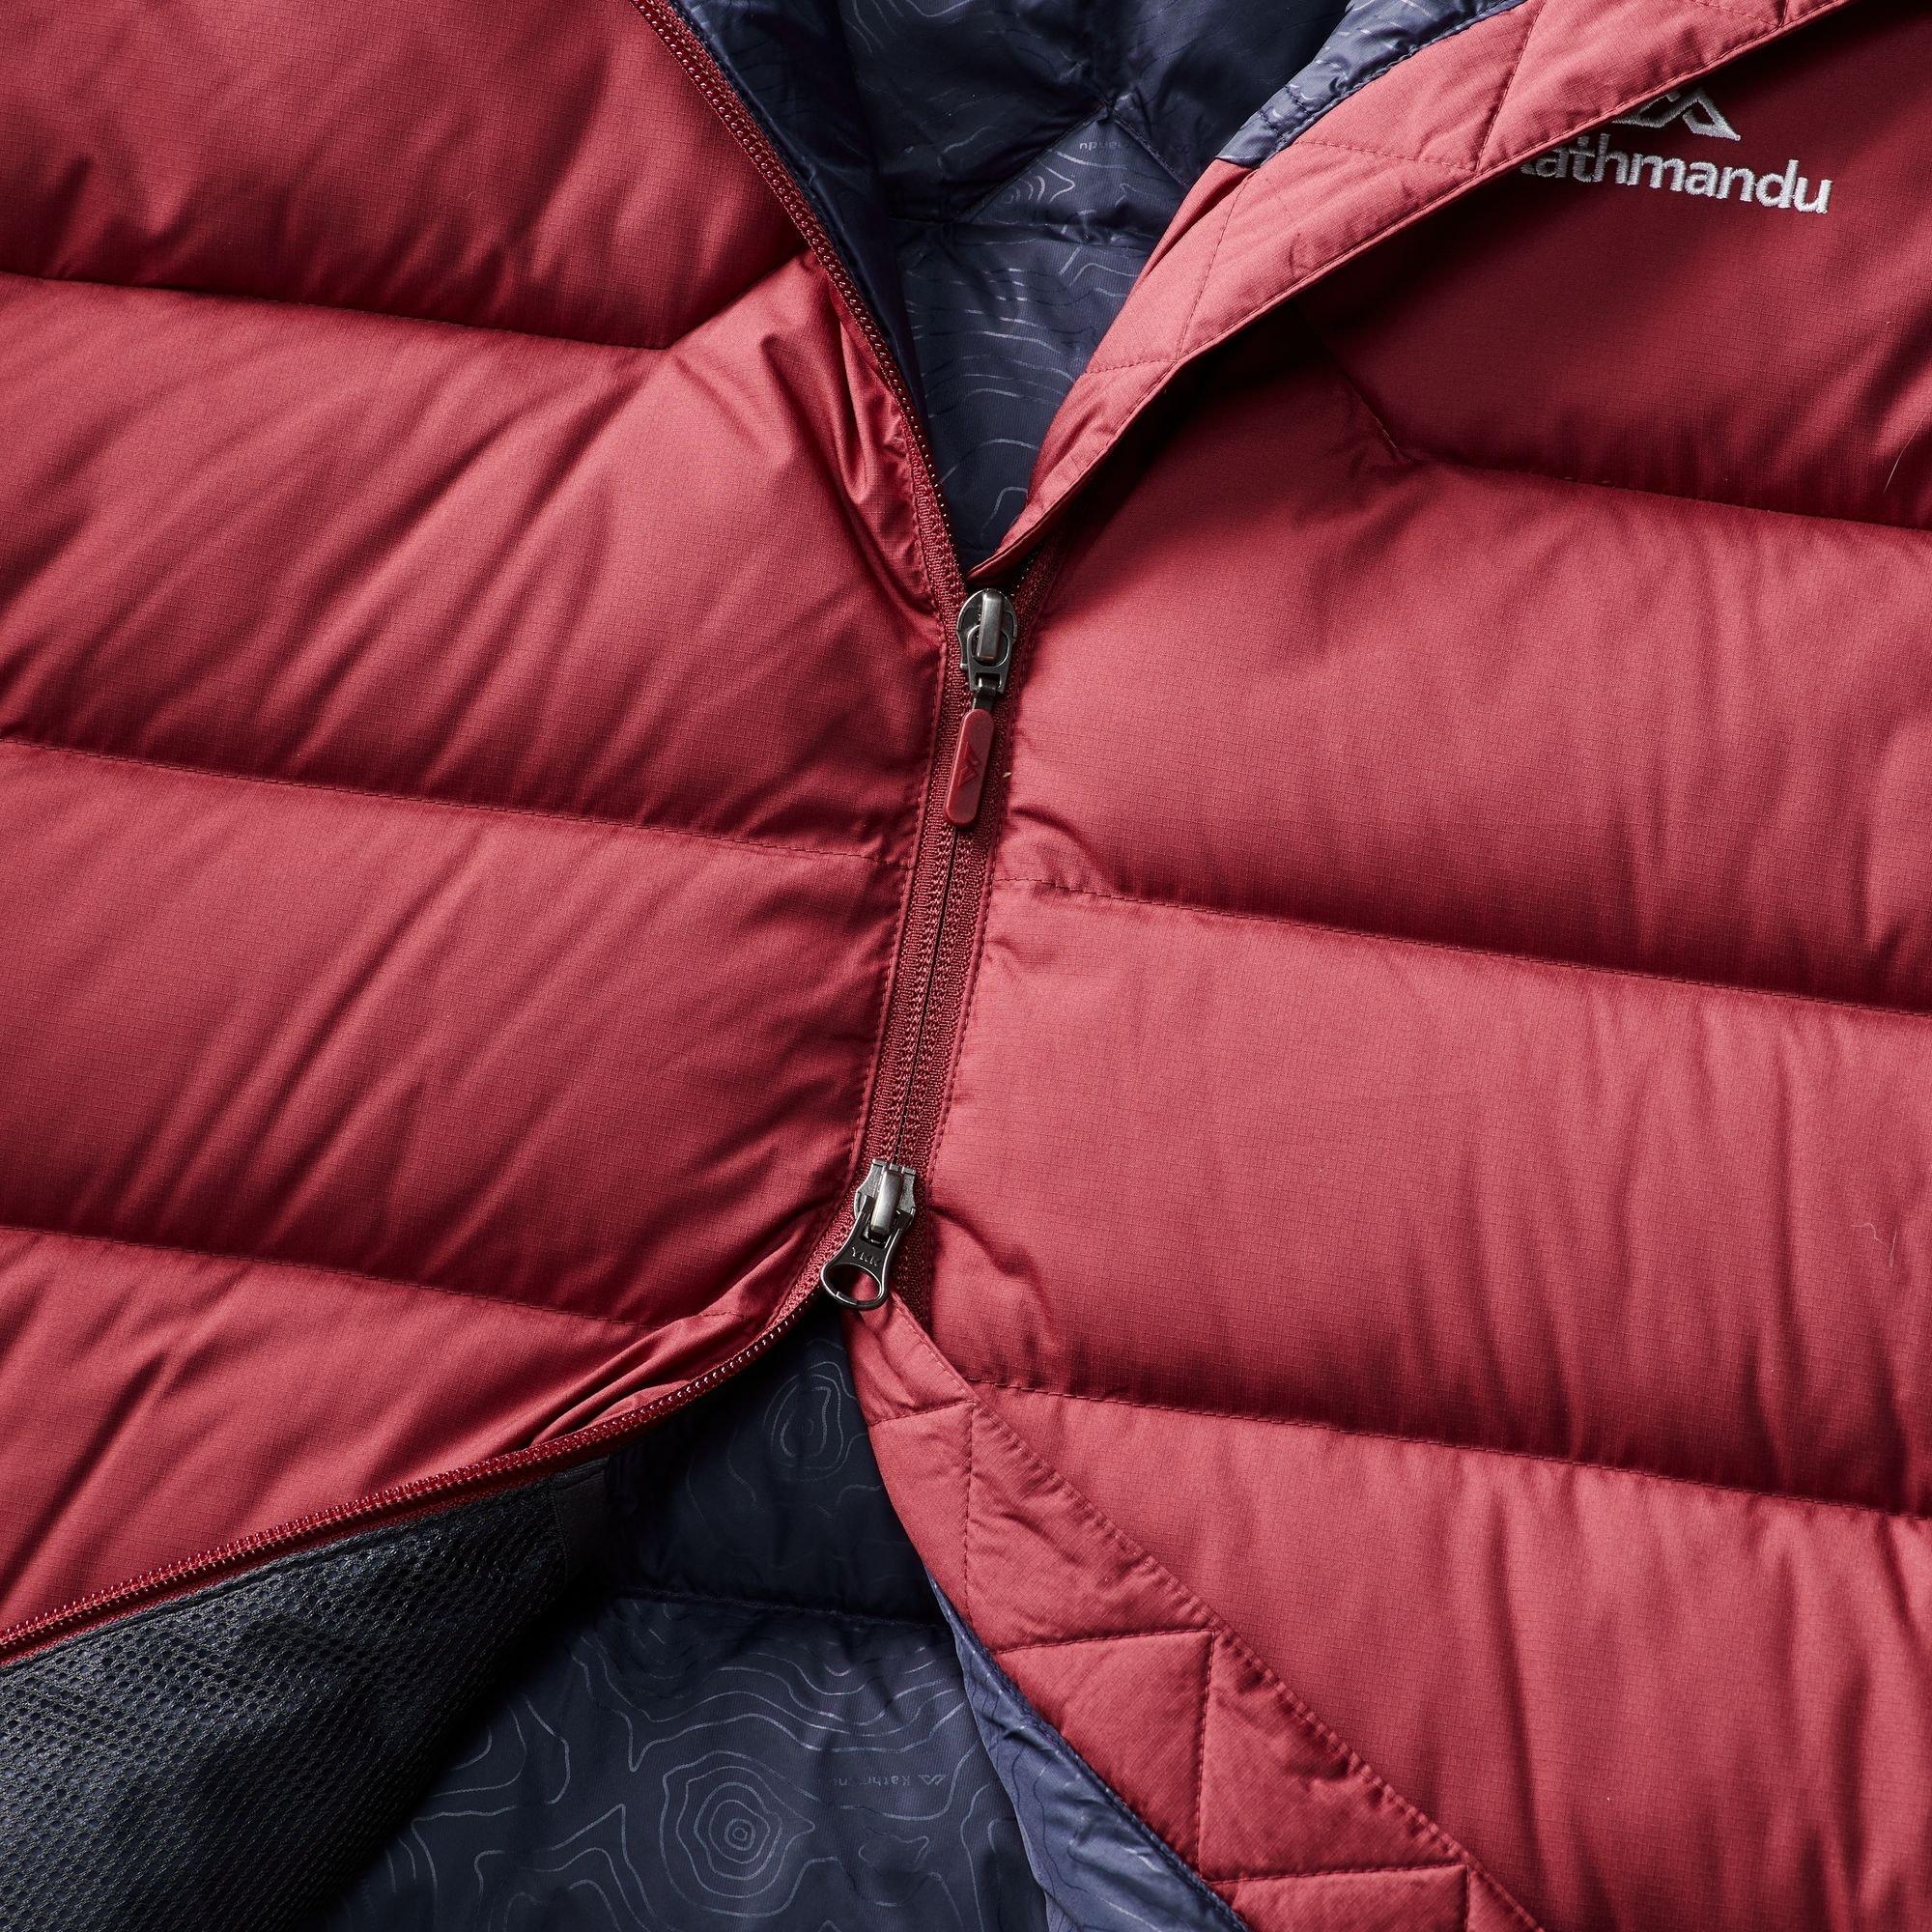 NEW-Kathmandu-Epiq-Men-039-s-Hooded-Warm-Winter-Duck-Down-Puffer-Jacket-v2 thumbnail 31